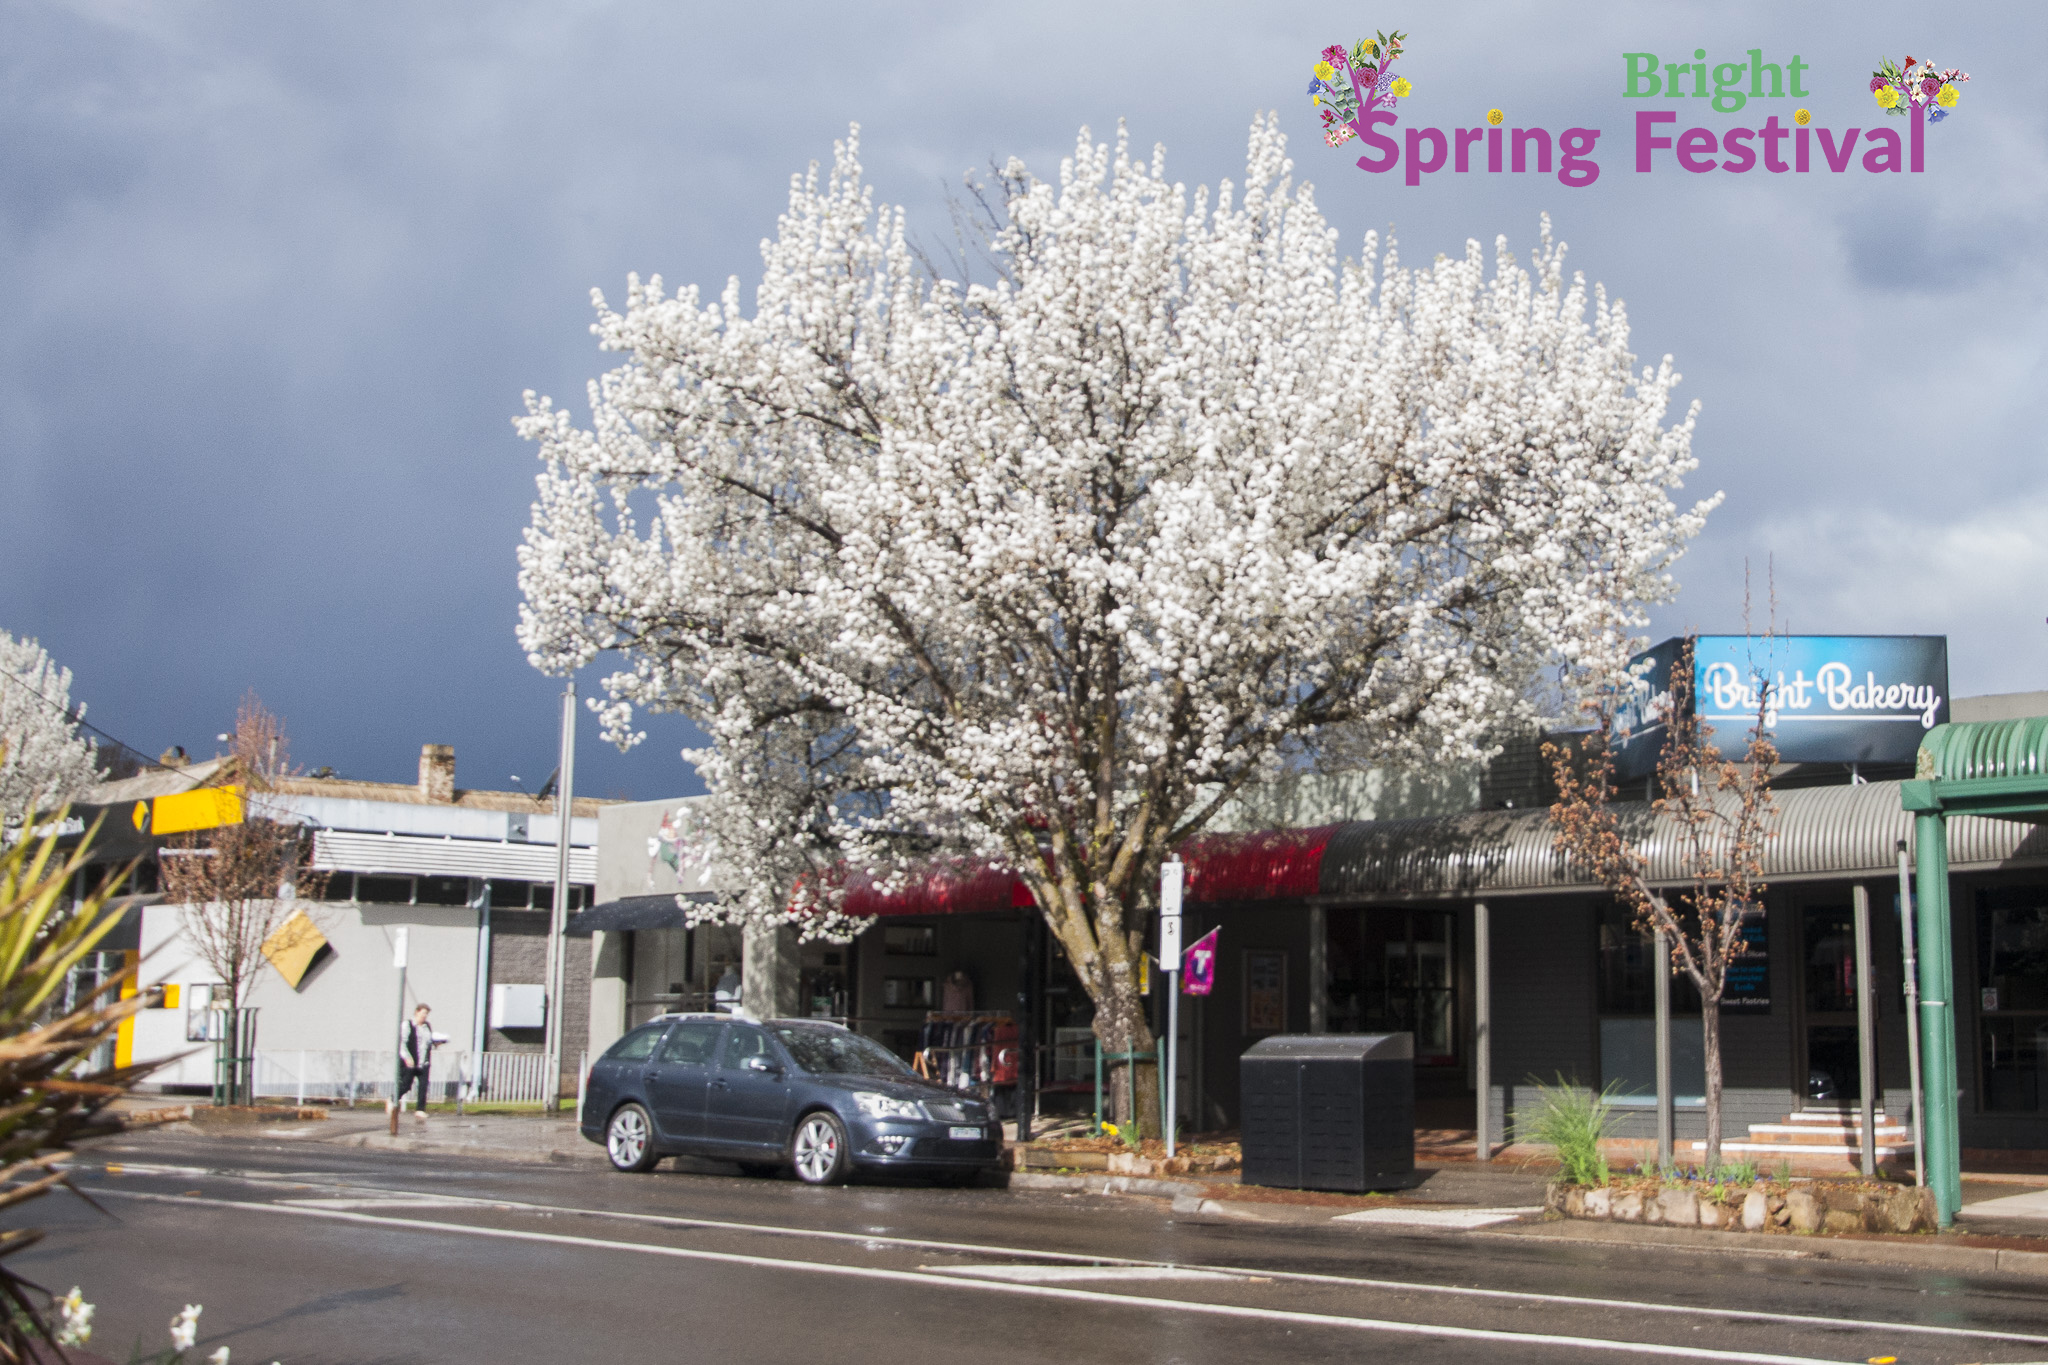 Brigh Spring Festival 1609 - 015